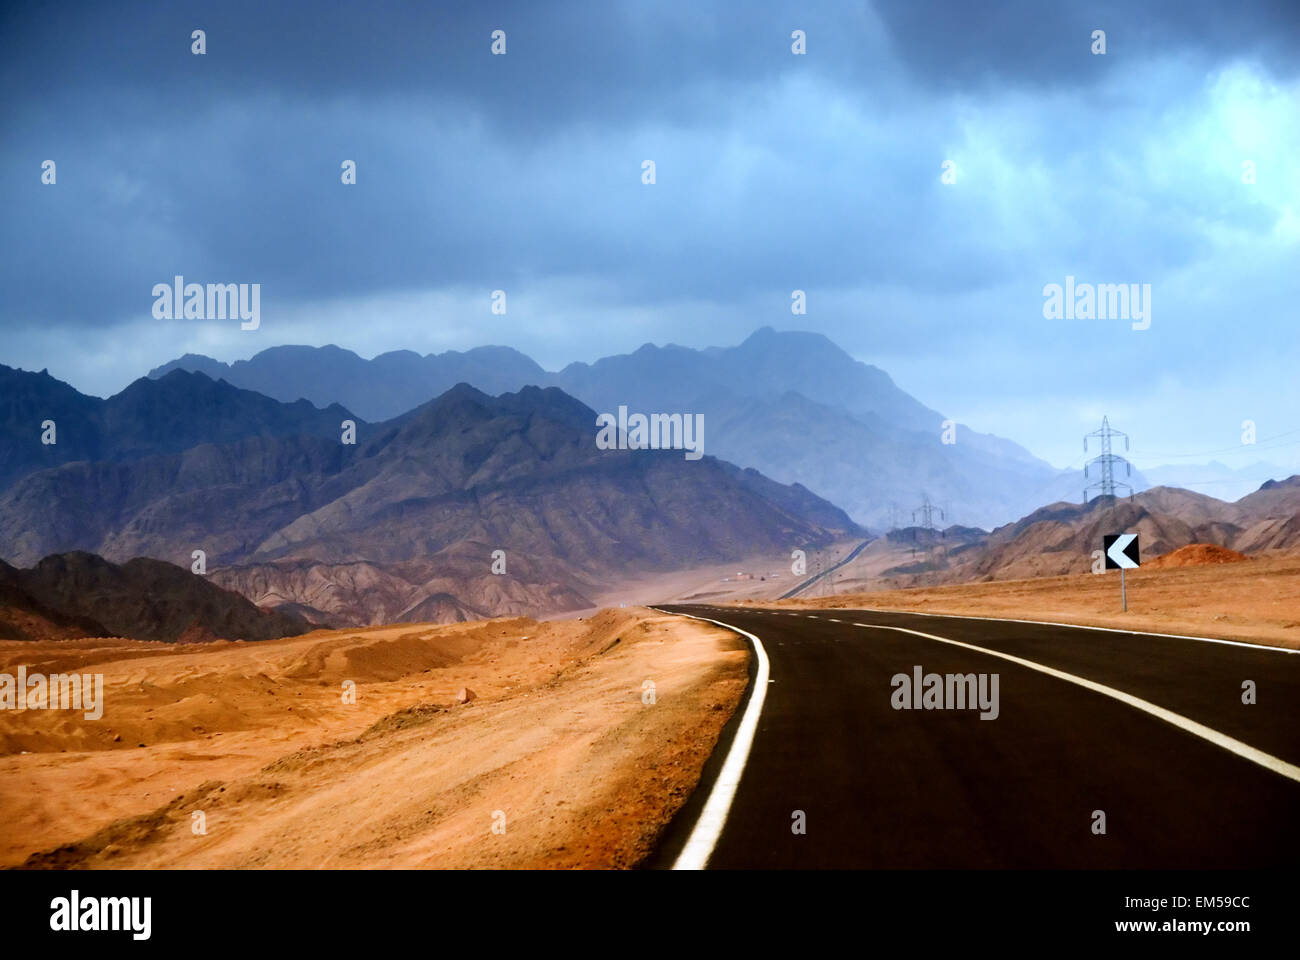 The road in the mountainous desert of the Sinai Peninsula - Stock Image